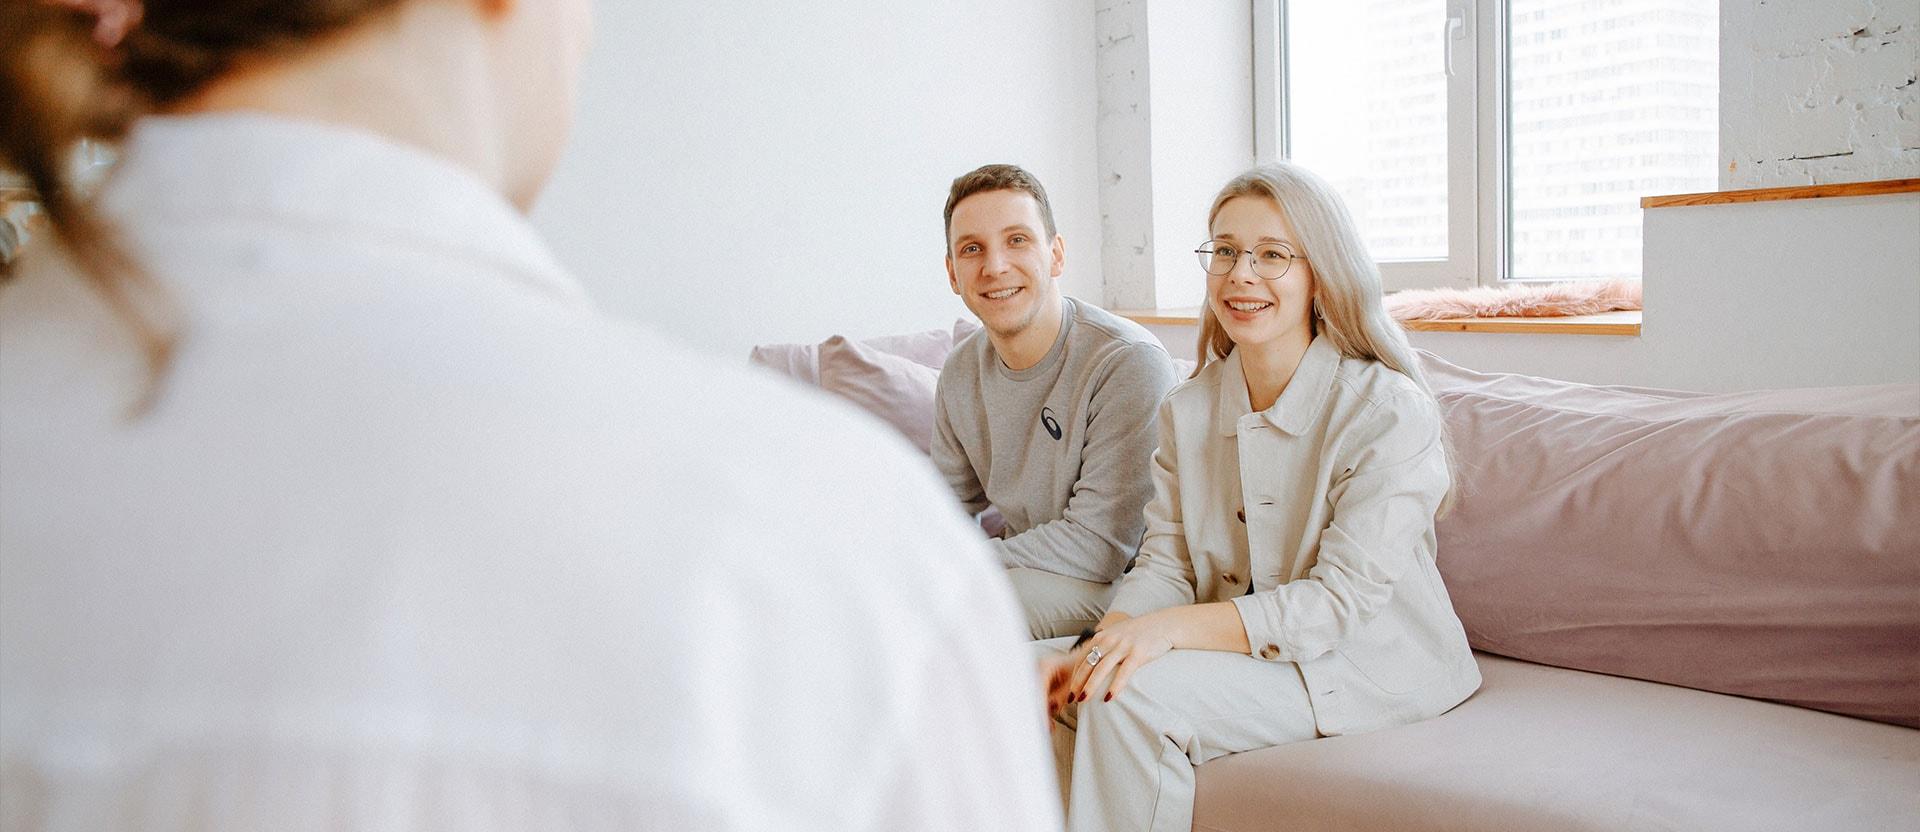 Foto ilustrativa de um casal na terapia